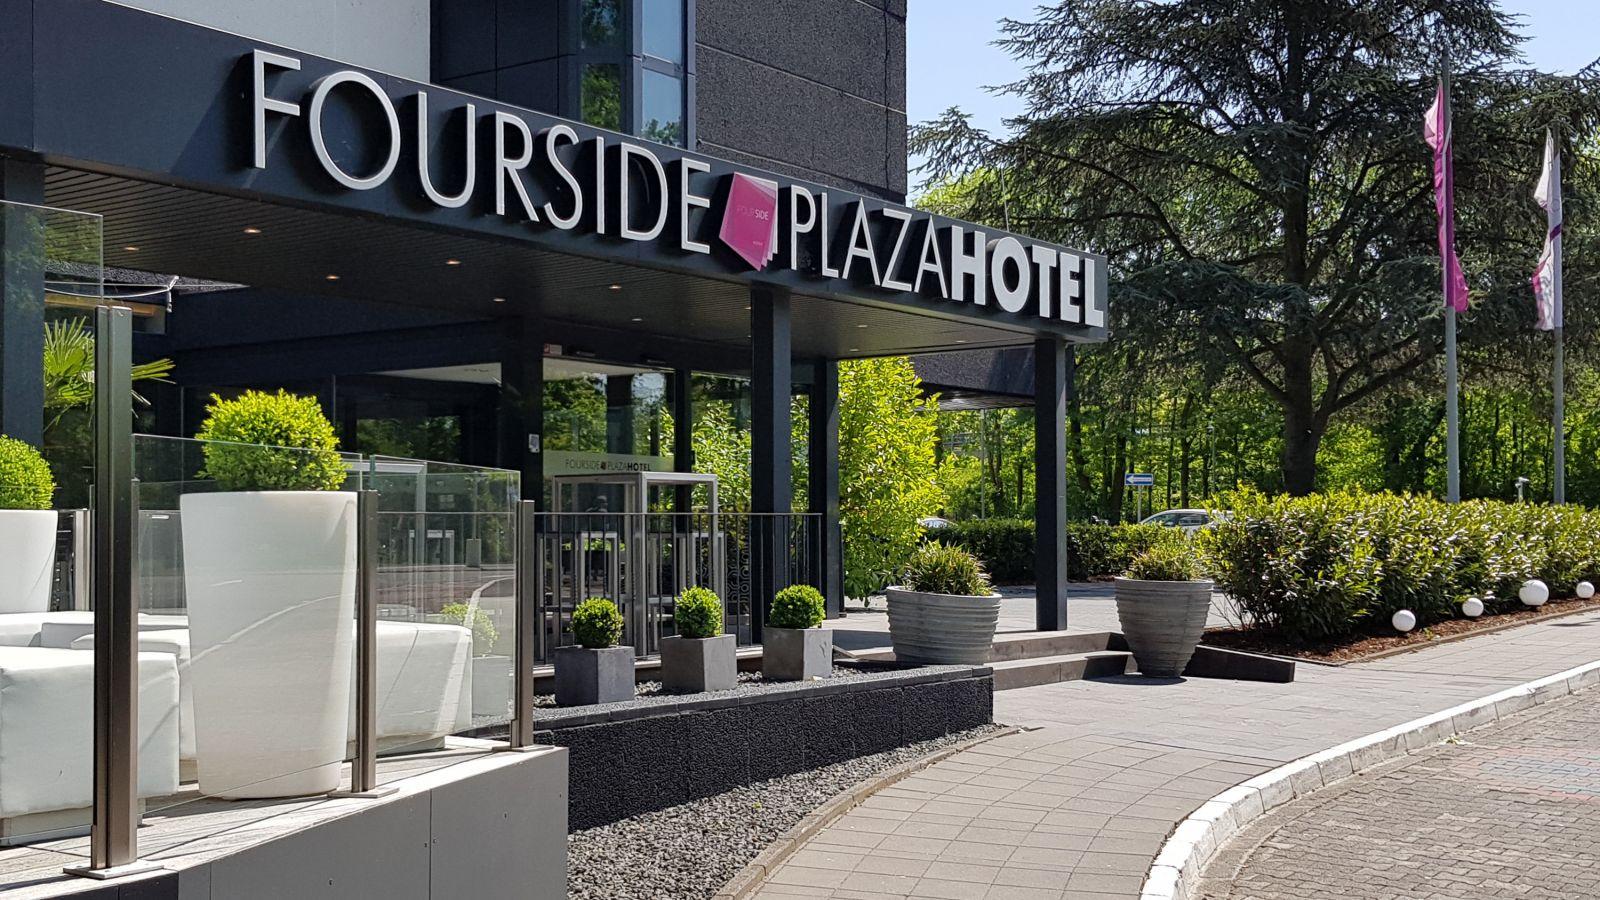 Enders Gasgrill Trier : Fourside plaza hotel trier